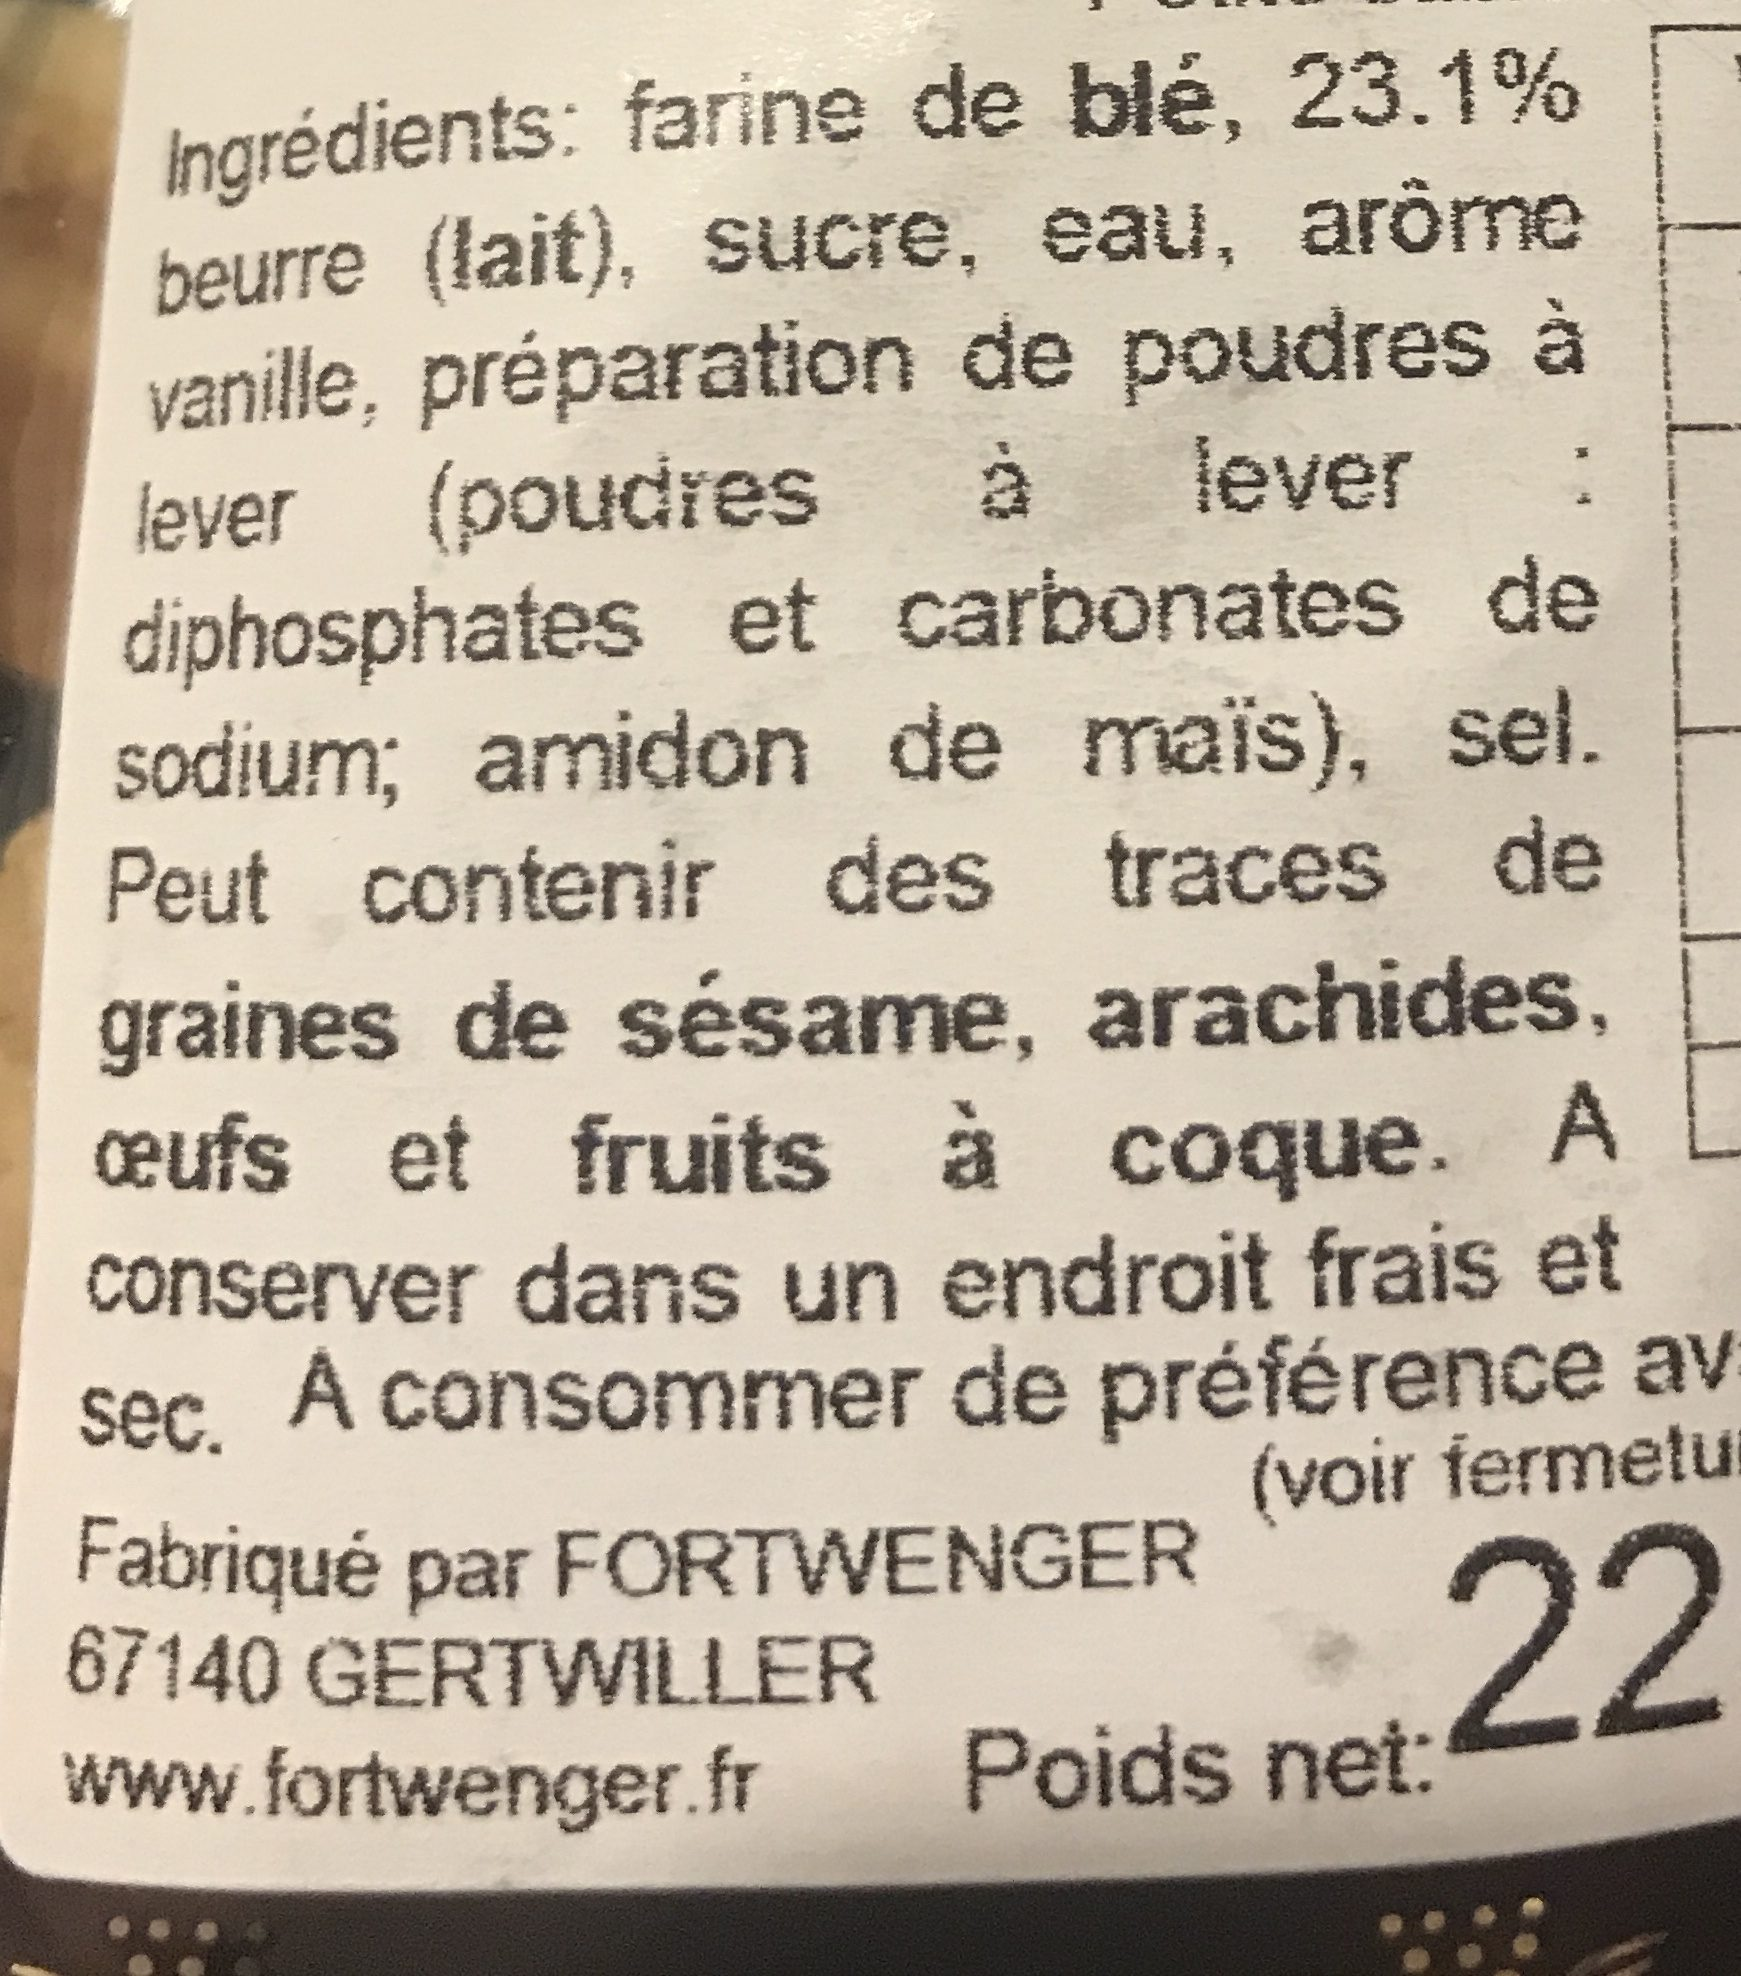 Spritz au beurre - Ingredients